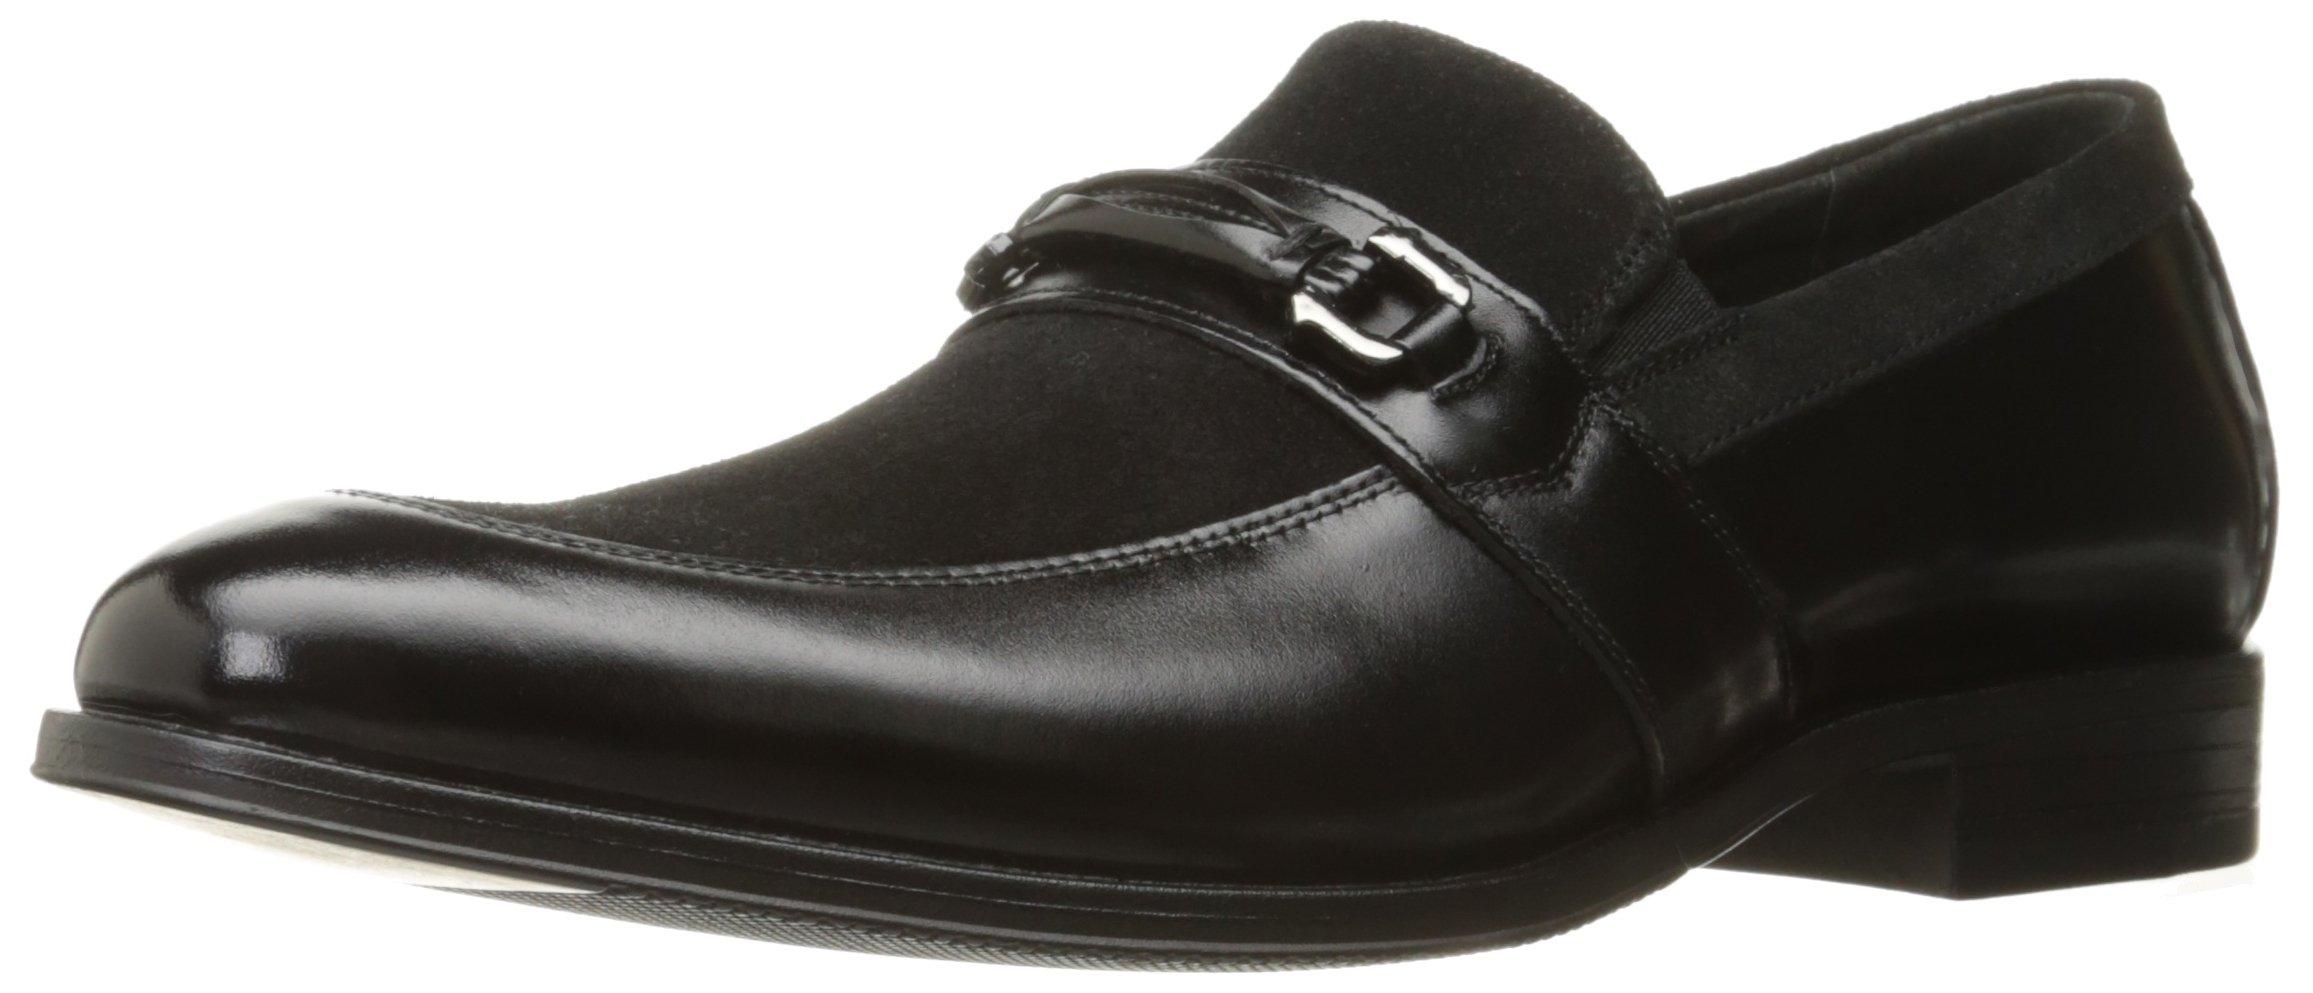 Stacy Adams Men's Selby Moc Toe Bit Slip-On Loafer, Black, 10 M US